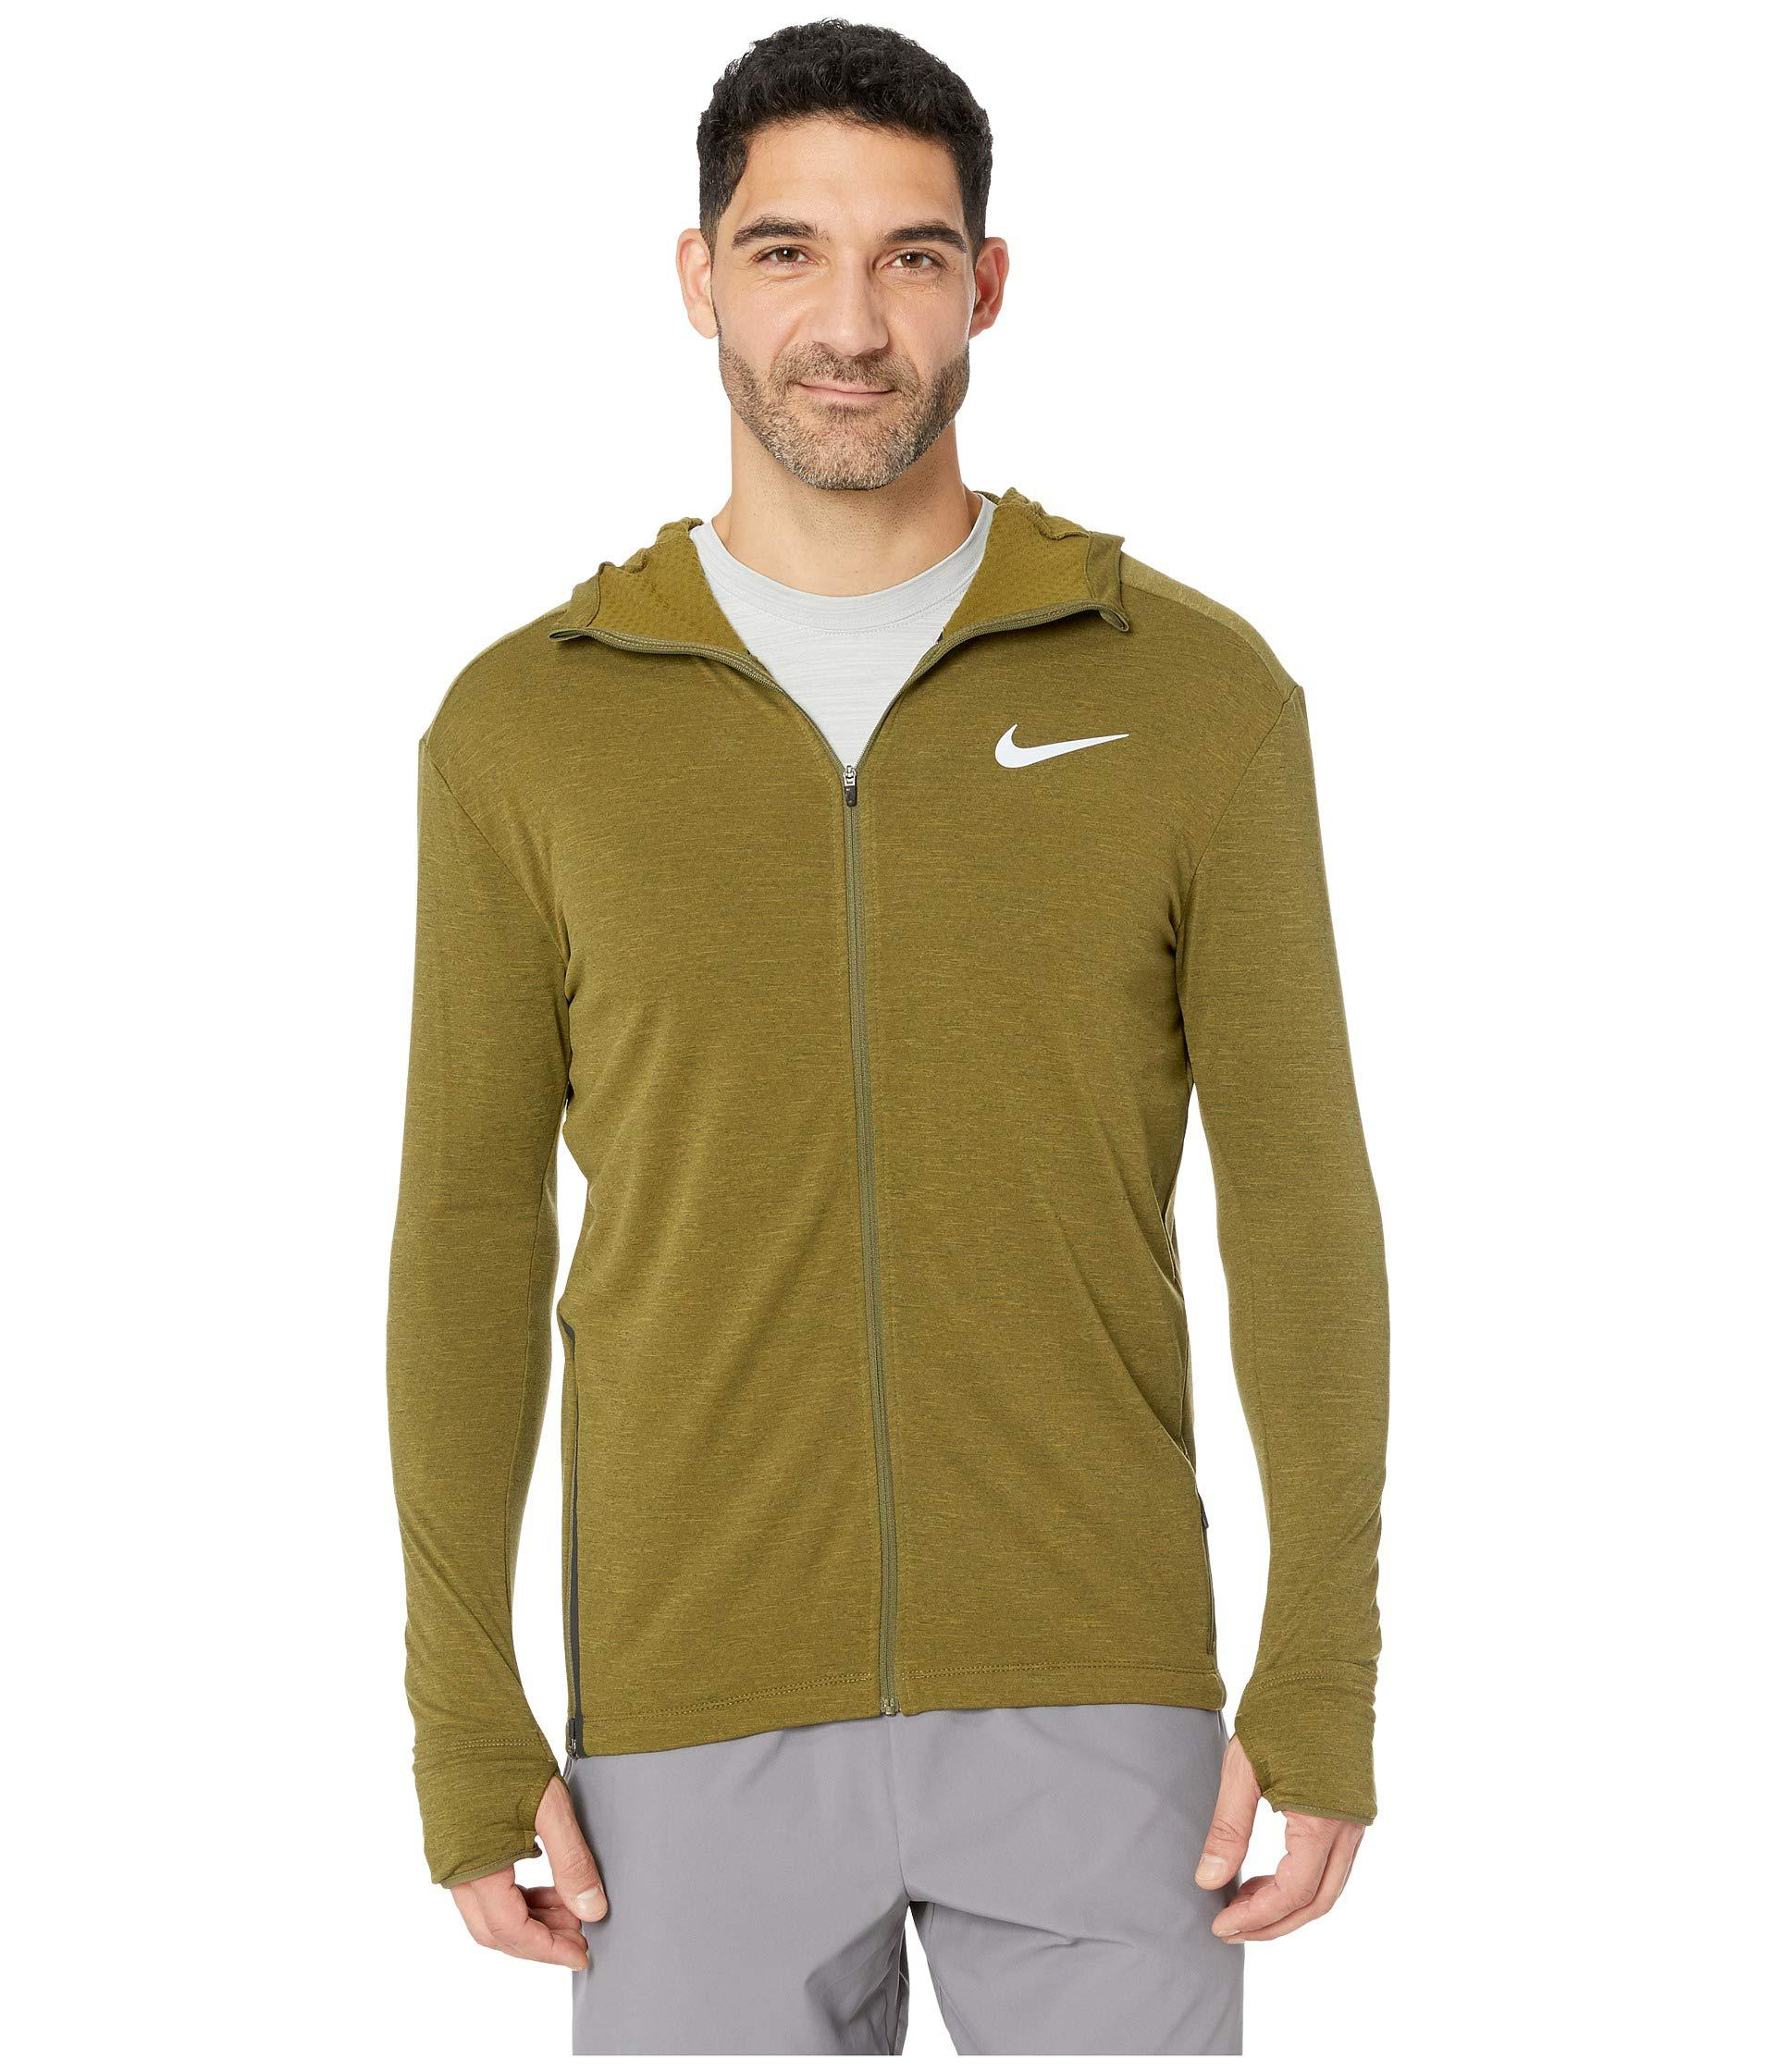 7ba9d25a22ce62 Lyst - Nike Sphere Element Hoodie Full Zip 2.0 in Green for Men ...